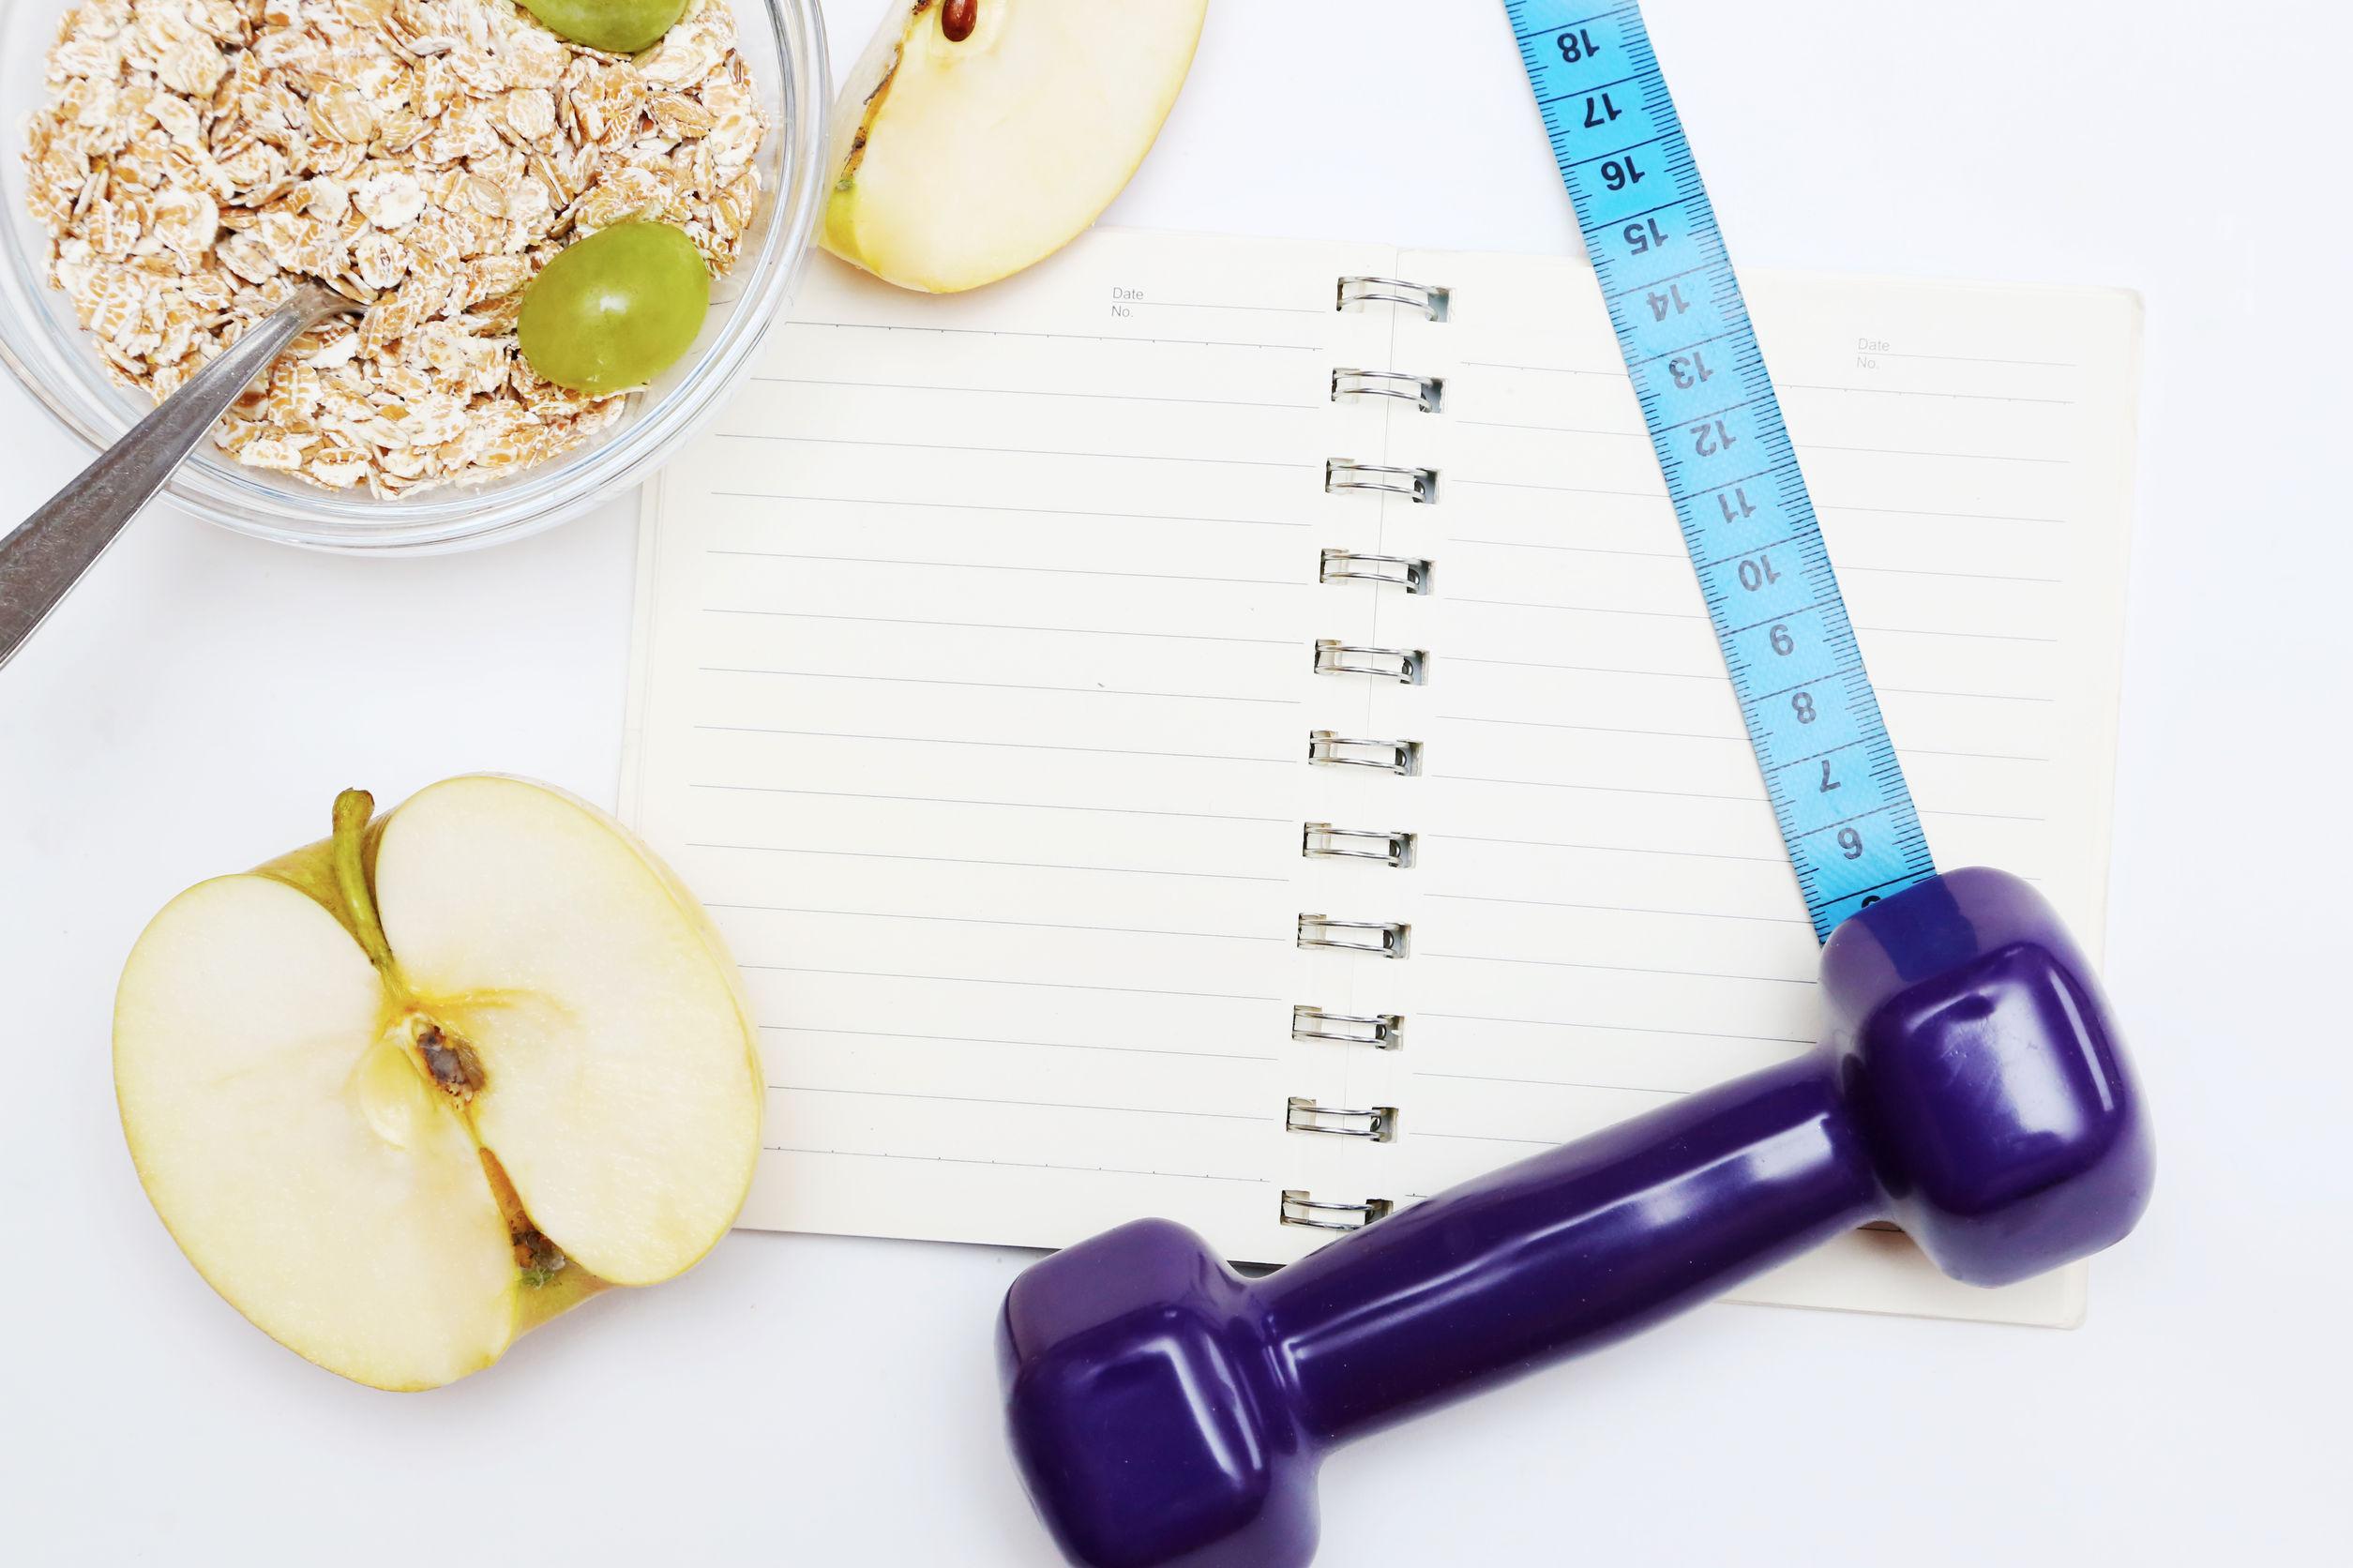 triocean150100192.jpg - diet diary, healthy lifestyle concept. add own text.